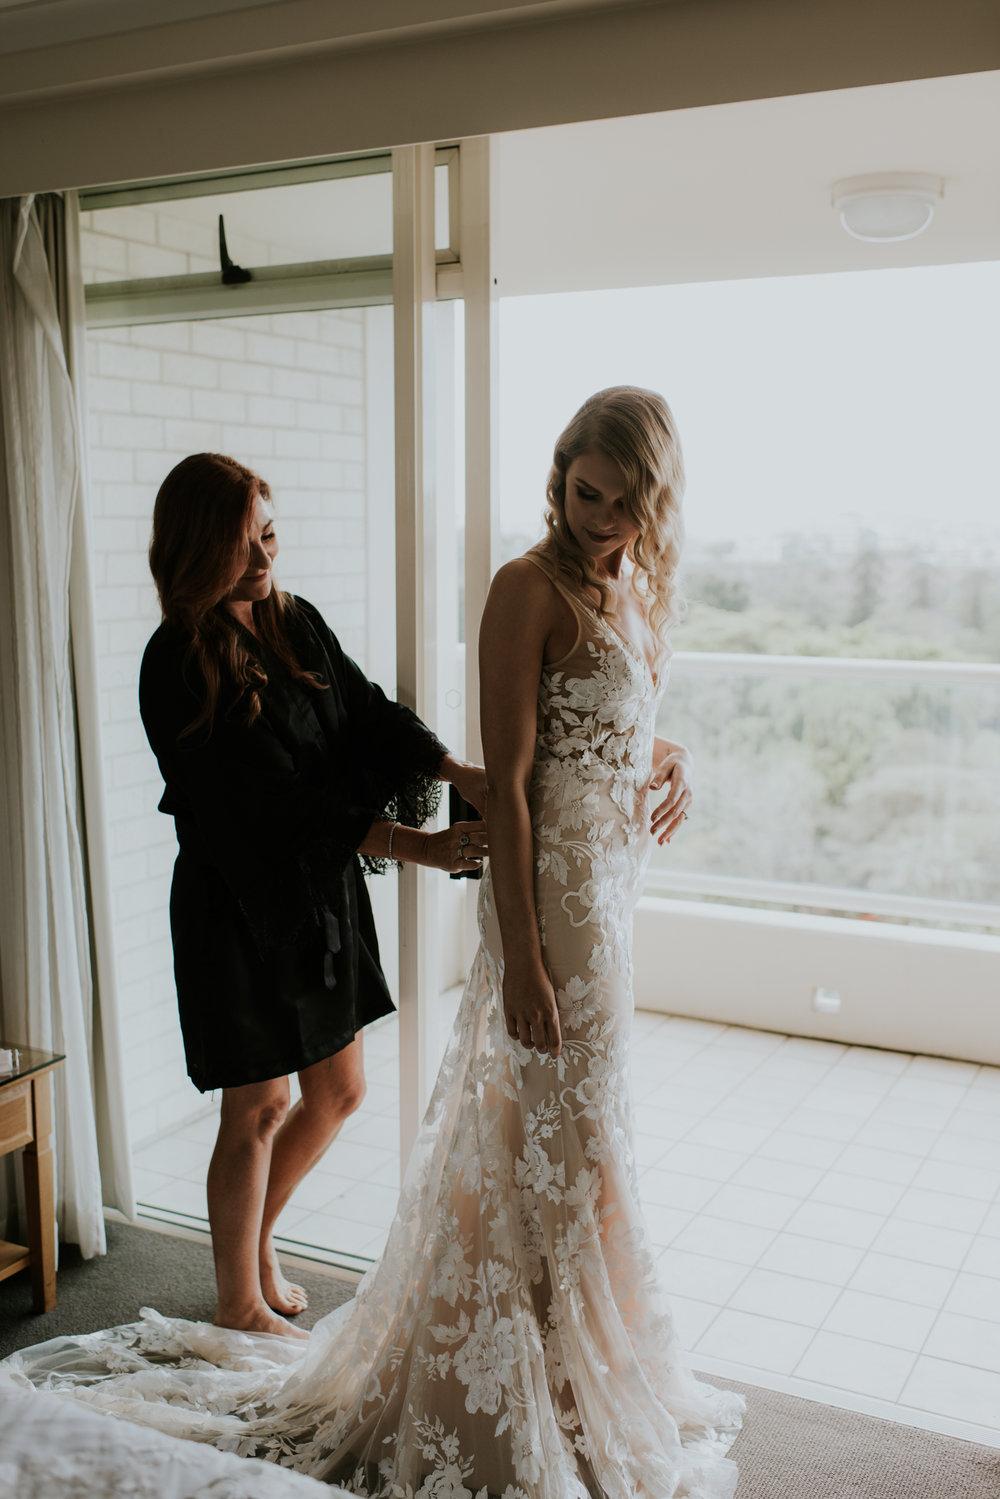 Brisbane Wedding Photographer | Engagement-Elopement Photography | Factory51-City Botantic Gardens Wedding-11.jpg